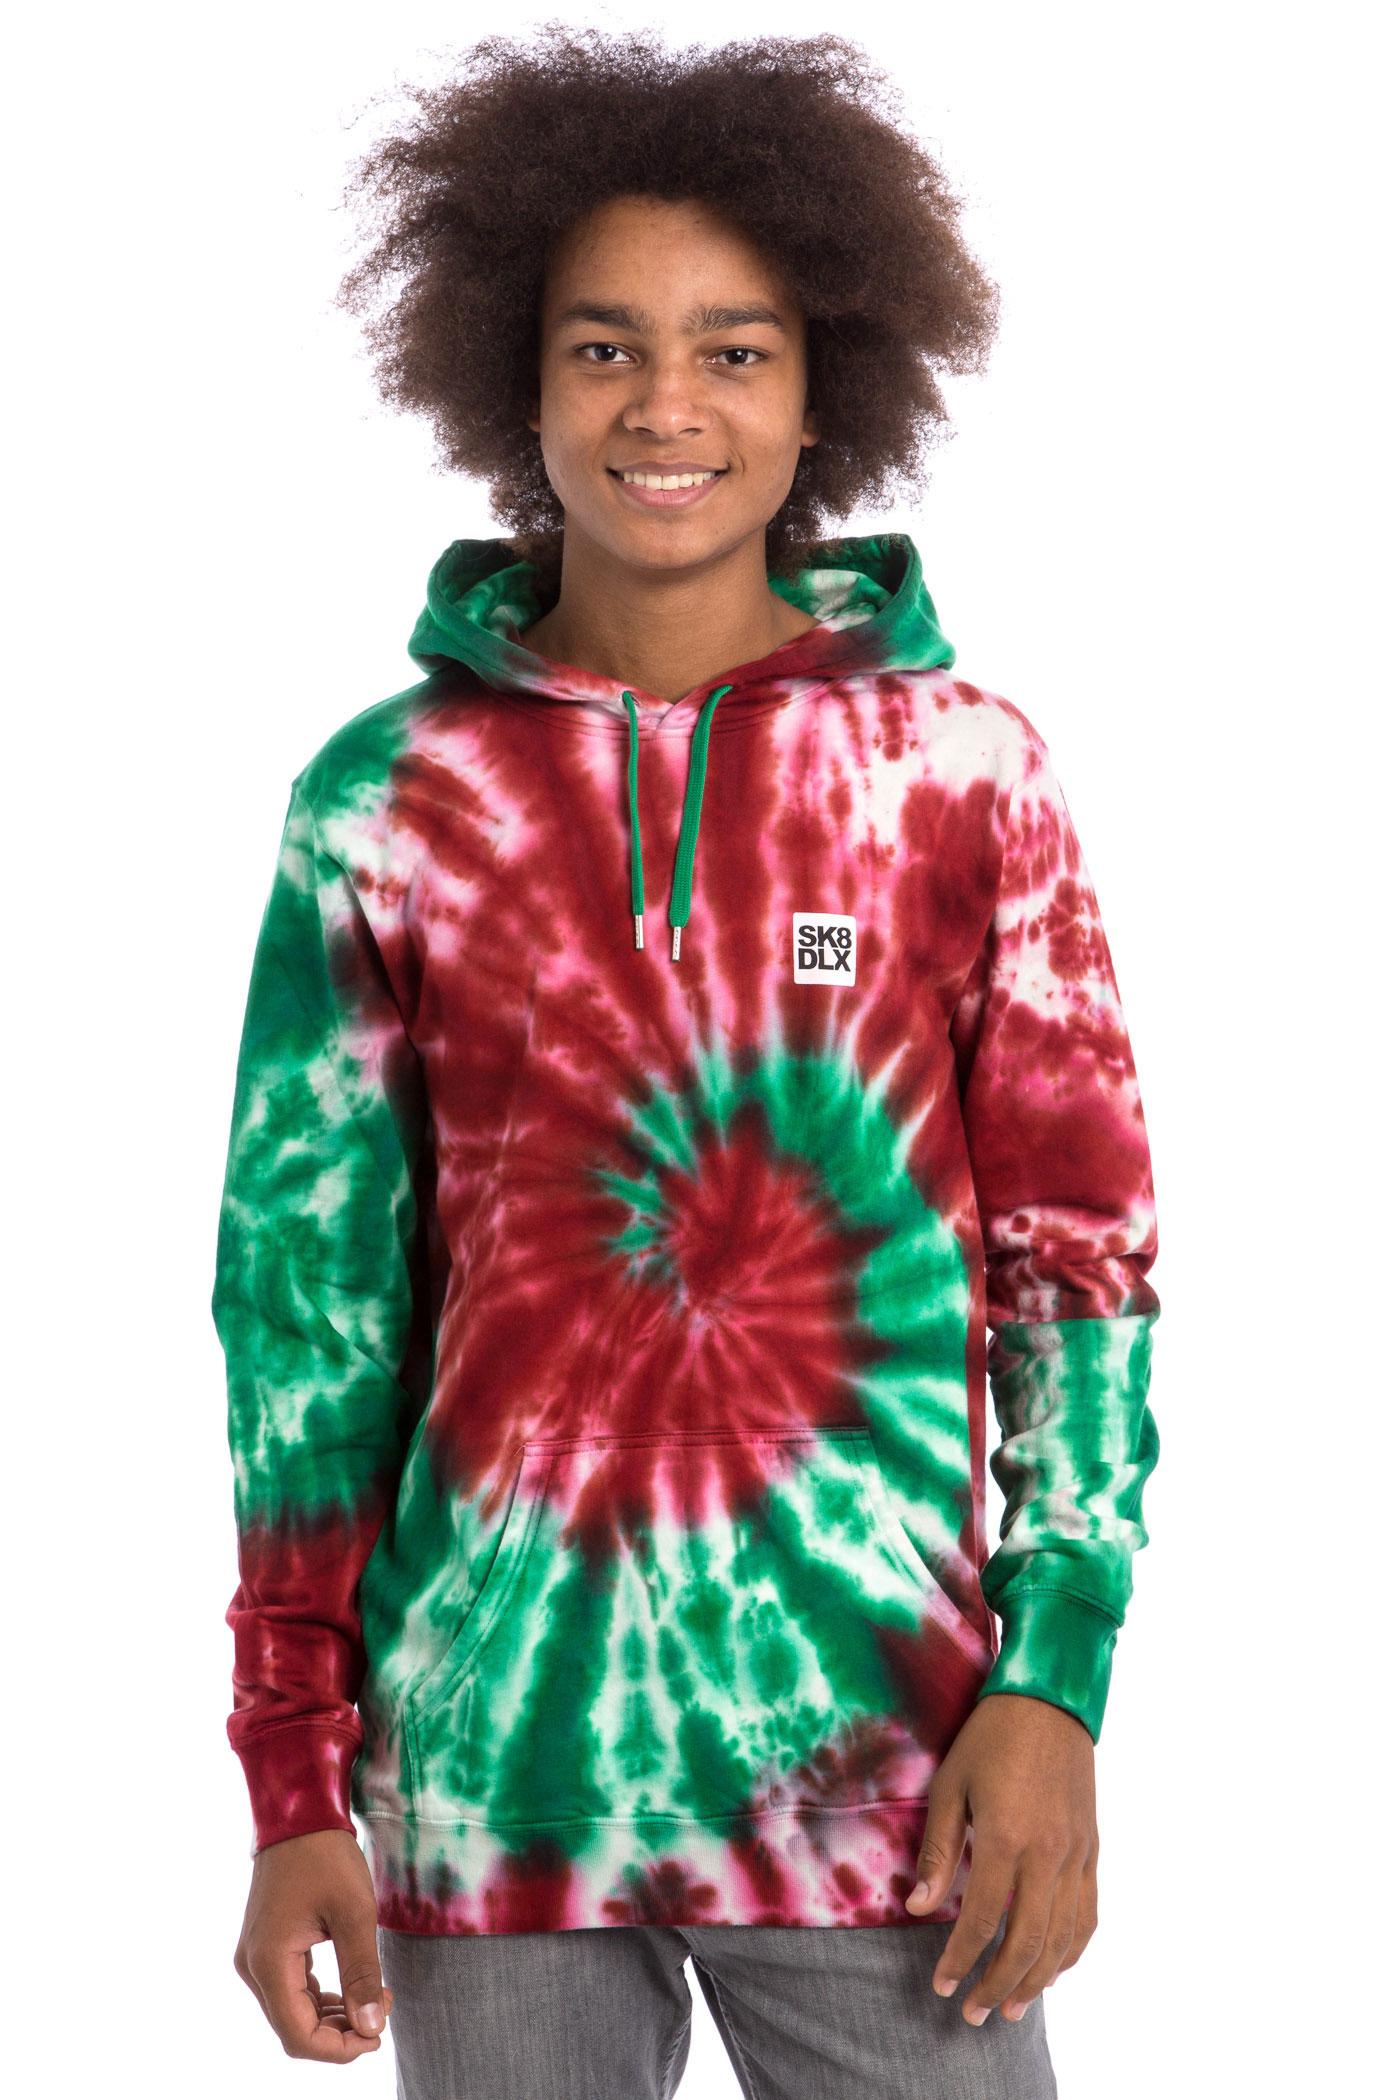 sk8dlx tie dye hoodie red green kaufen bei skatedeluxe. Black Bedroom Furniture Sets. Home Design Ideas